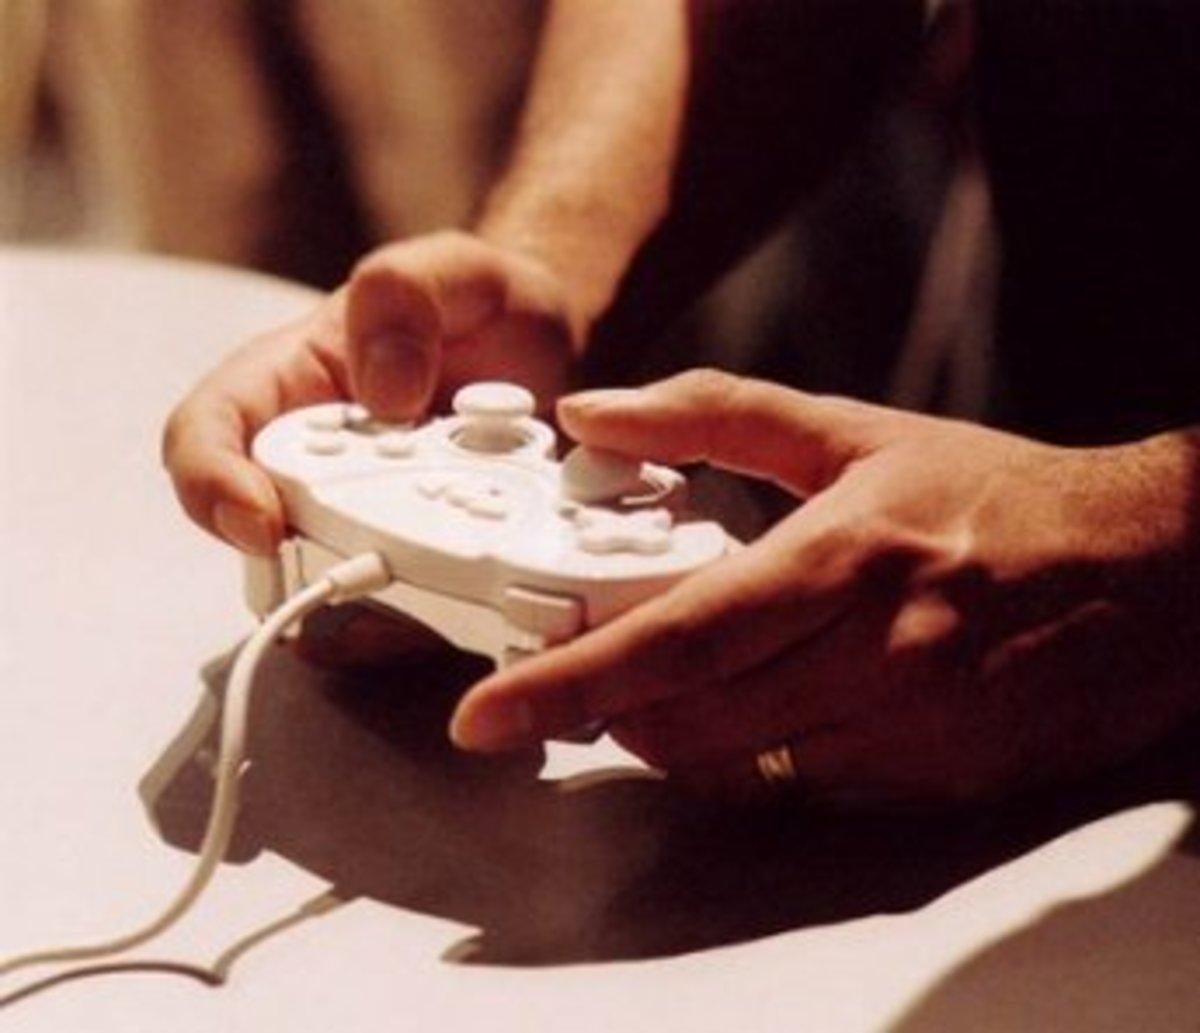 virtual-addiction-dangers-of-online-gaming